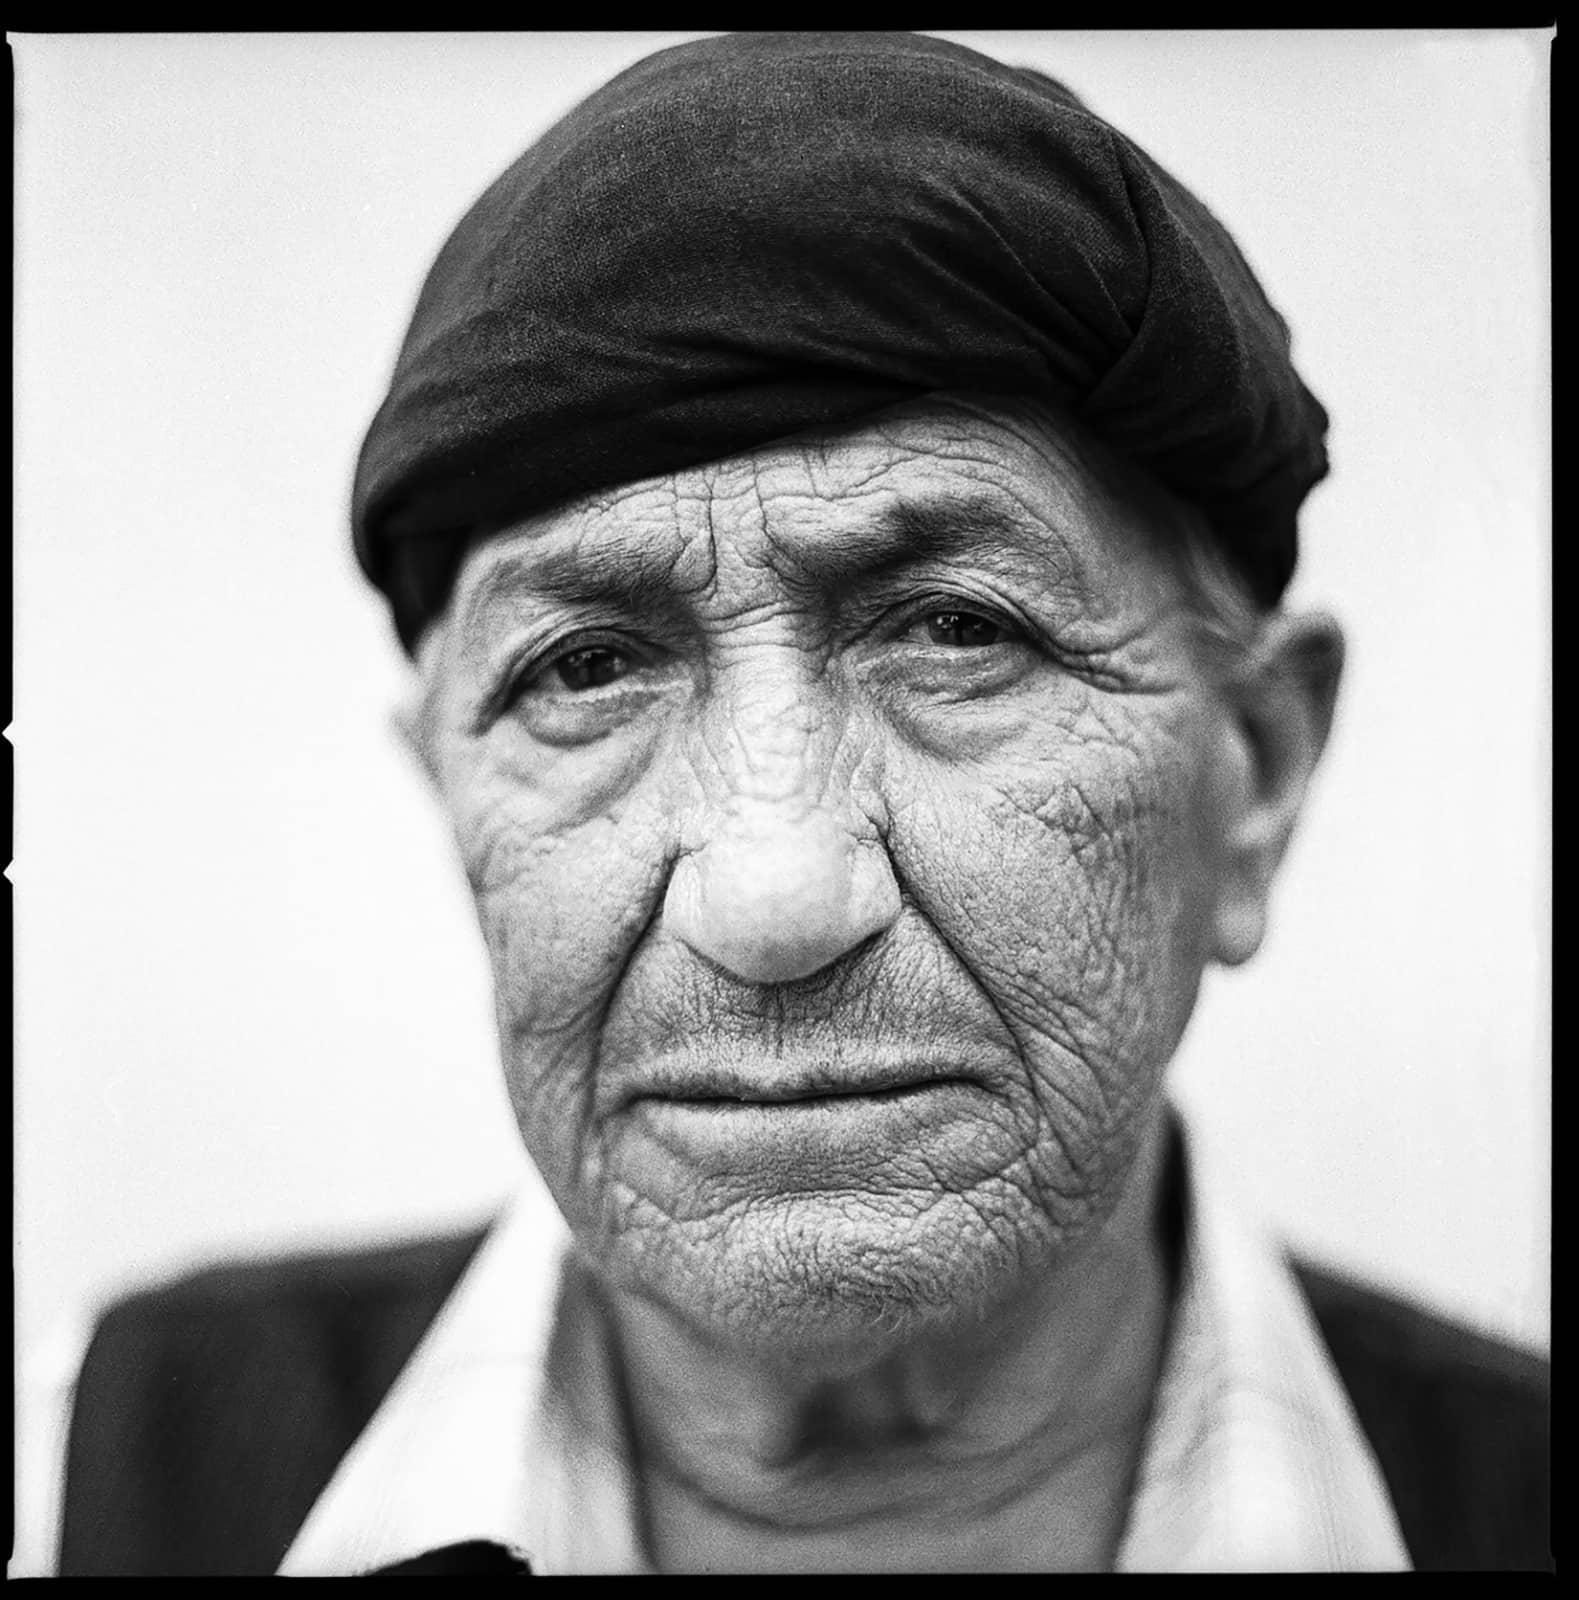 foto: © Leander Varekamp - portret oude man